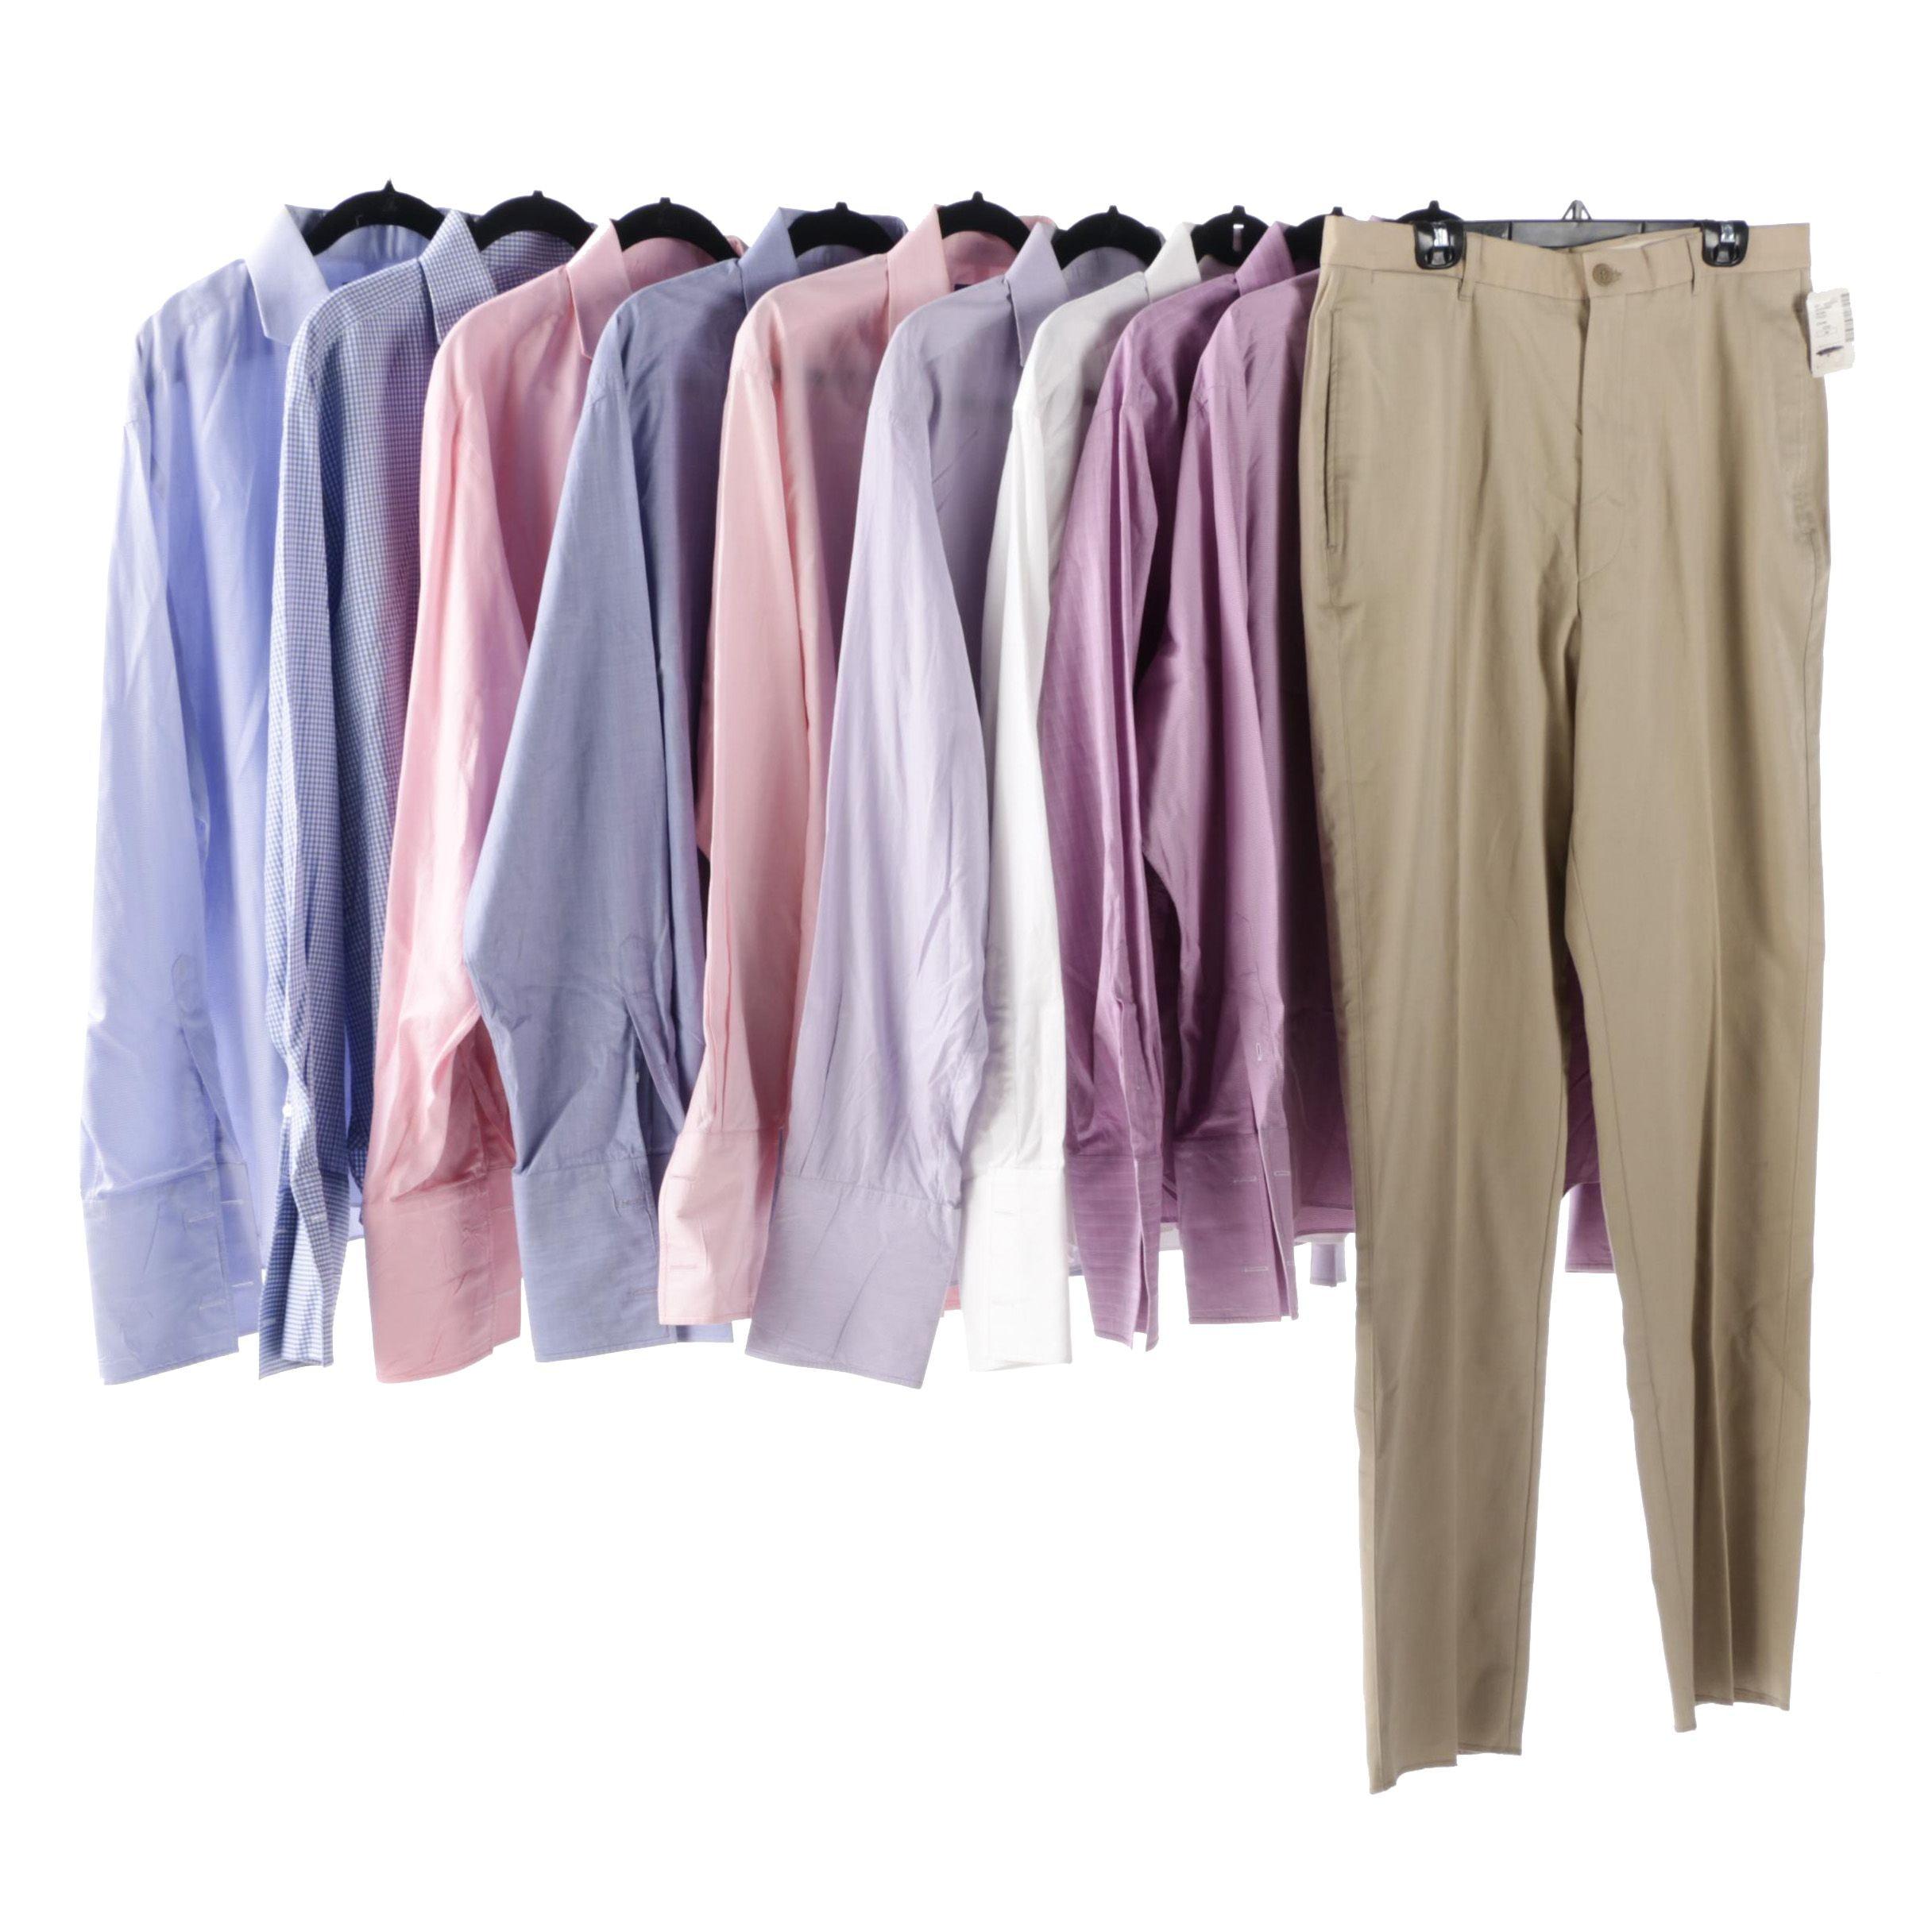 Ralph Lauren Bespoke Purple Label Cotton Dress Shirts and 5|48 Chinos